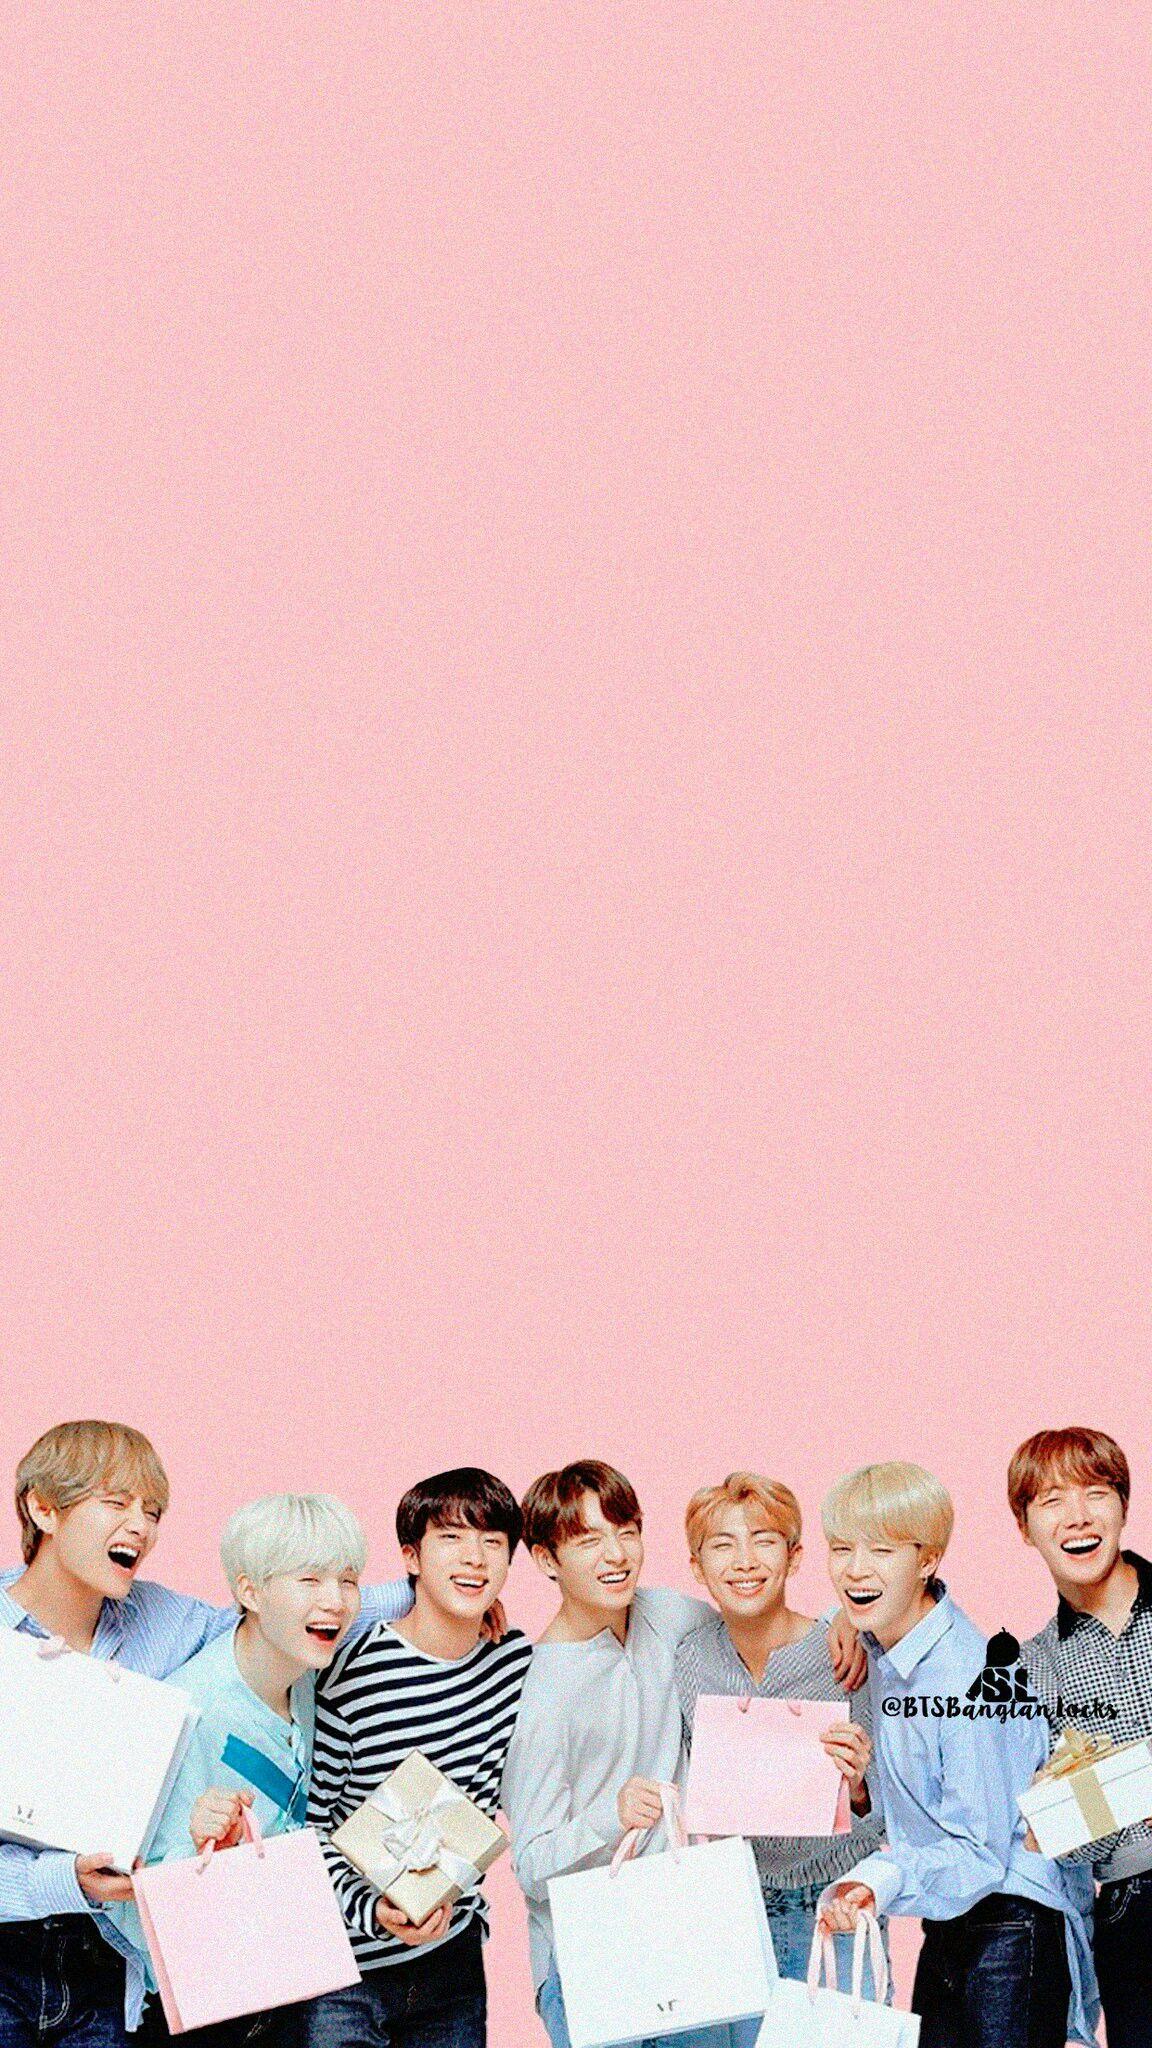 Bts Wallpaper Bts Wallpaper Bts Backgrounds Bts Pictures Bts wallpaper pink background